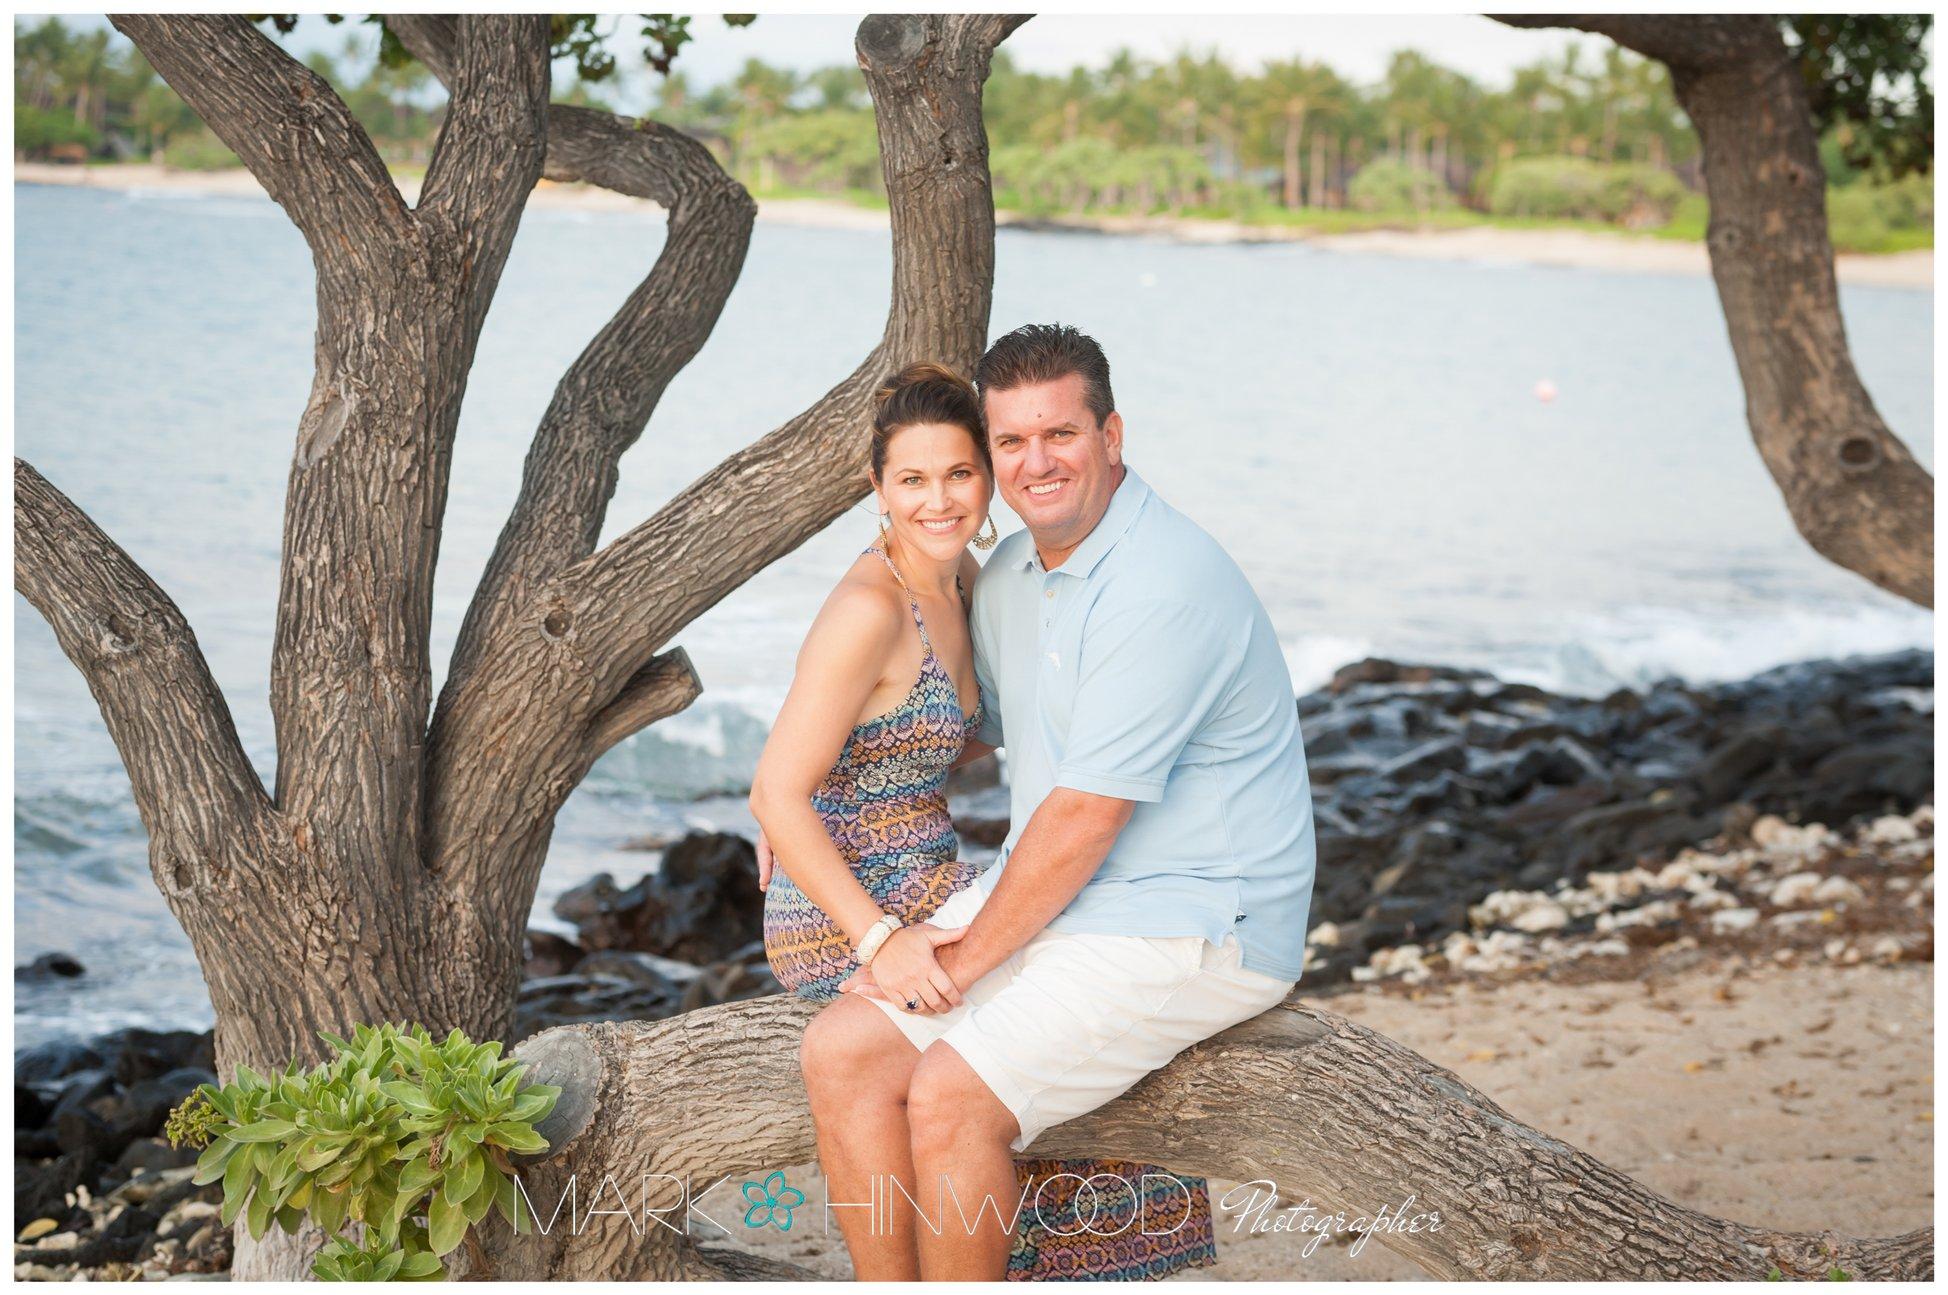 Family Photographers Kona Waikoloa 19